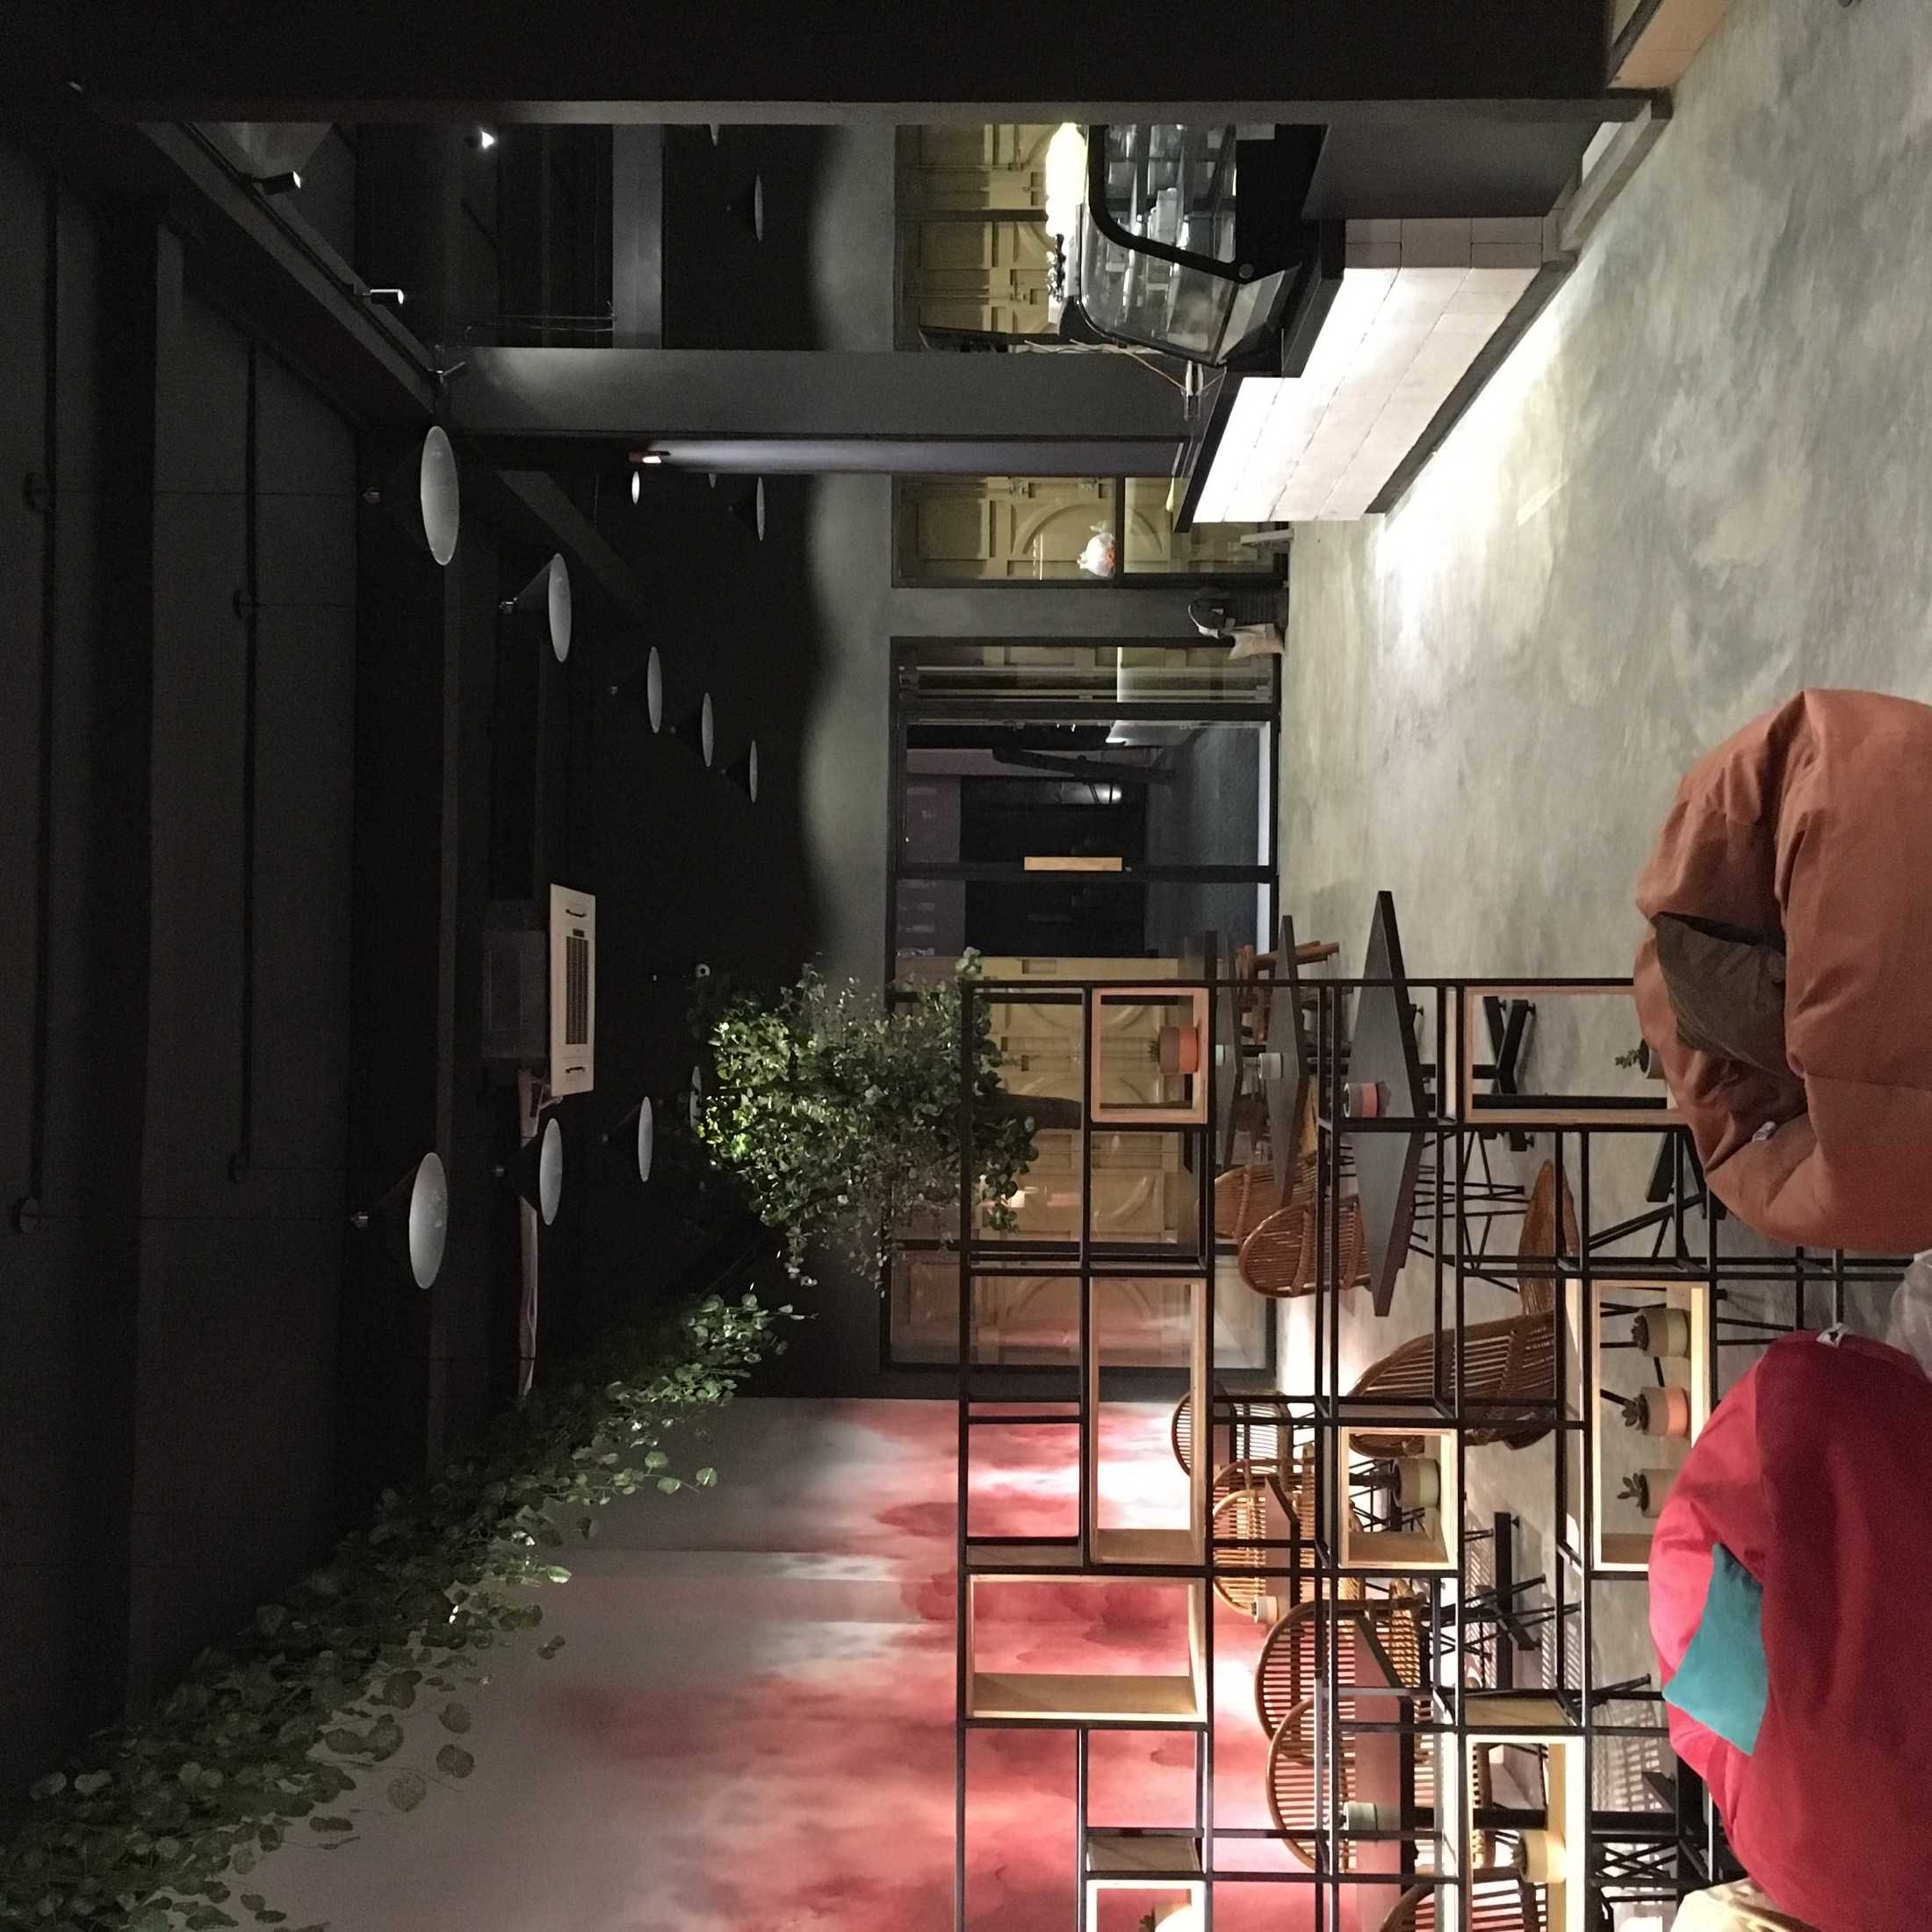 Studio Alo Duklu Coffee Medan, Kota Medan, Sumatera Utara, Indonesia Medan, Kota Medan, Sumatera Utara, Indonesia Studio-Alo-Duklu-Coffee  120887